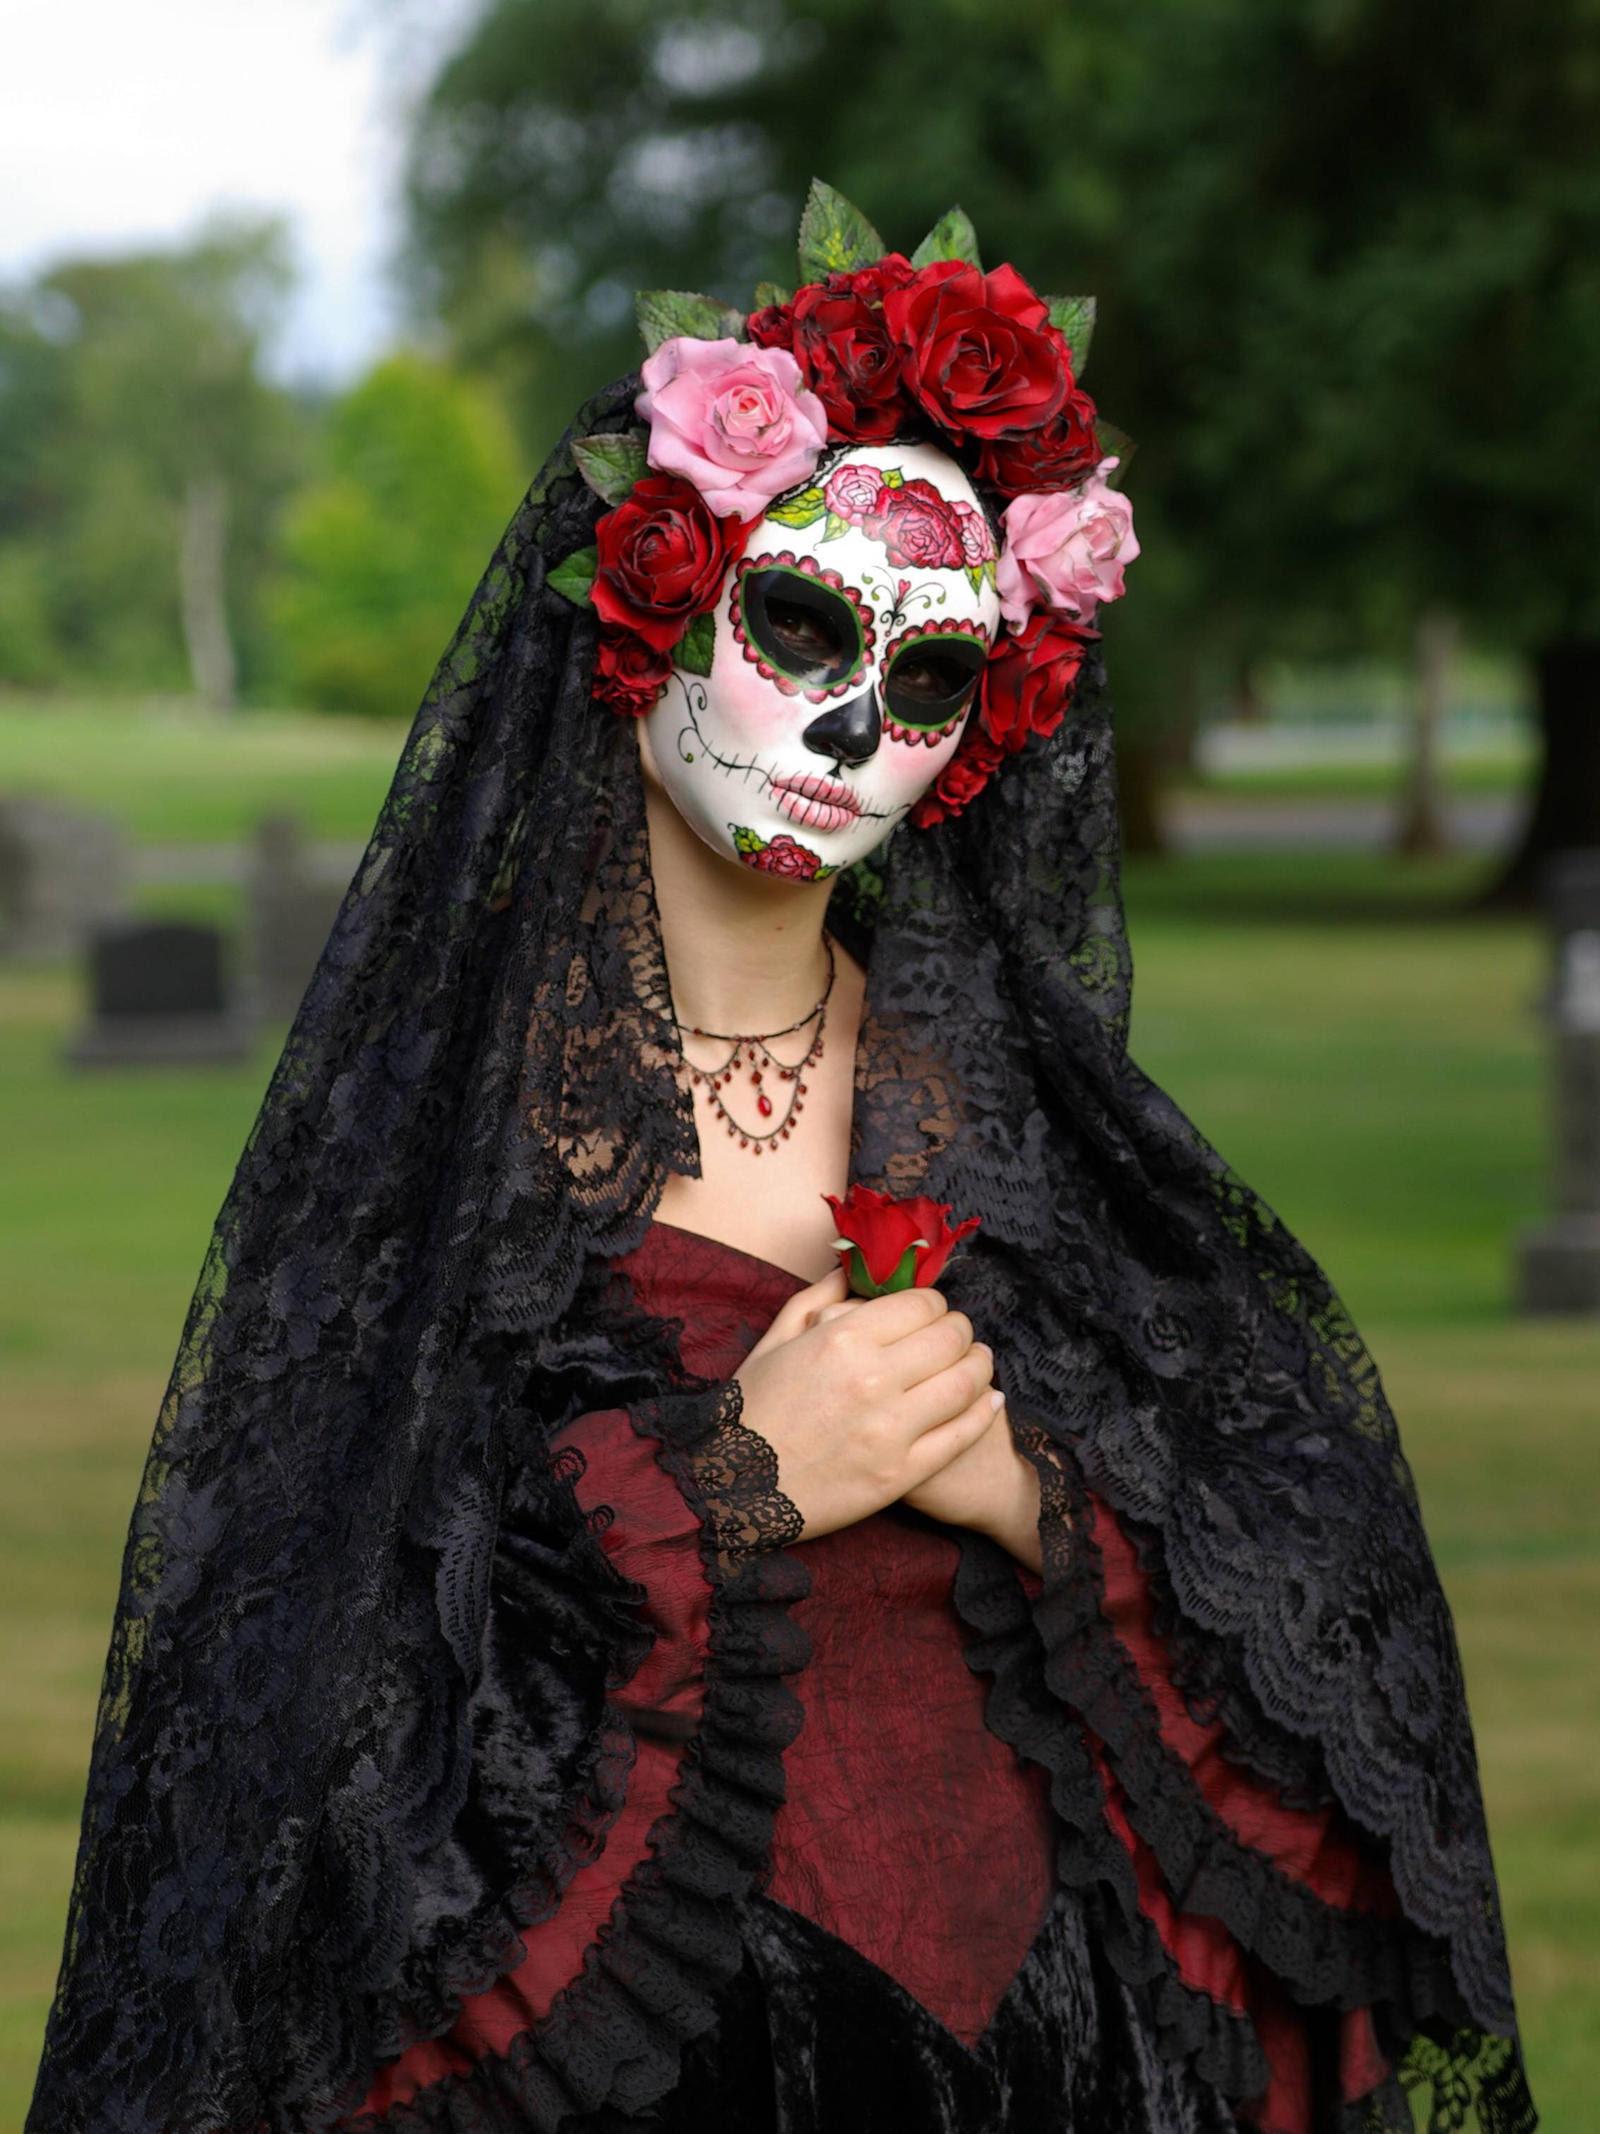 Handmade Mask-La Rosa Catrina by EffigyMasks on DeviantArt